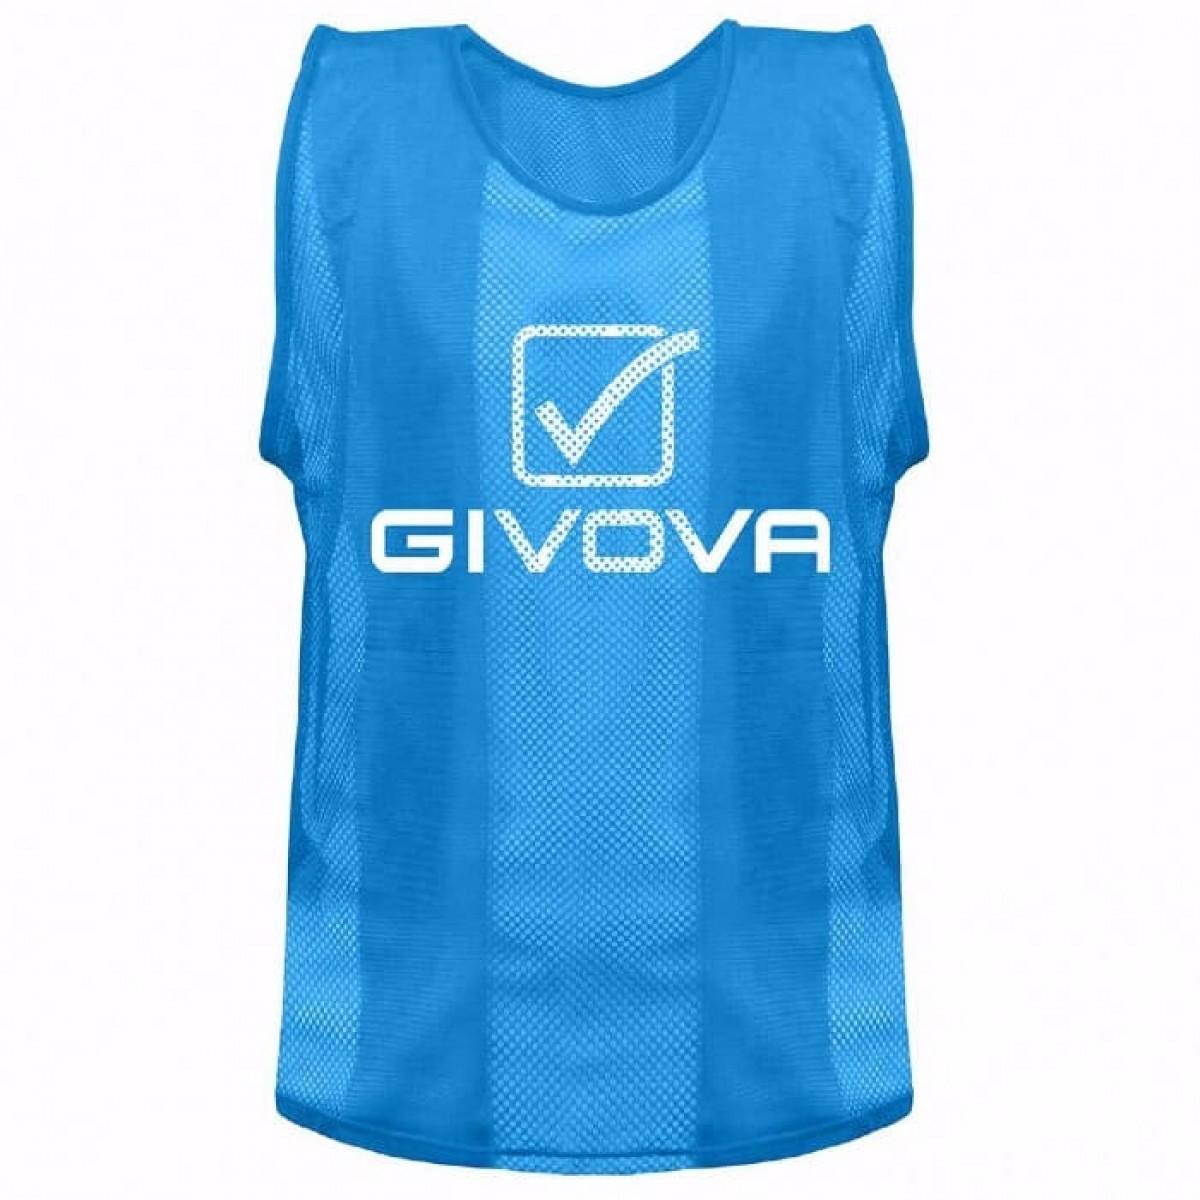 Givova Casacca Pro overtrækstrøje orange